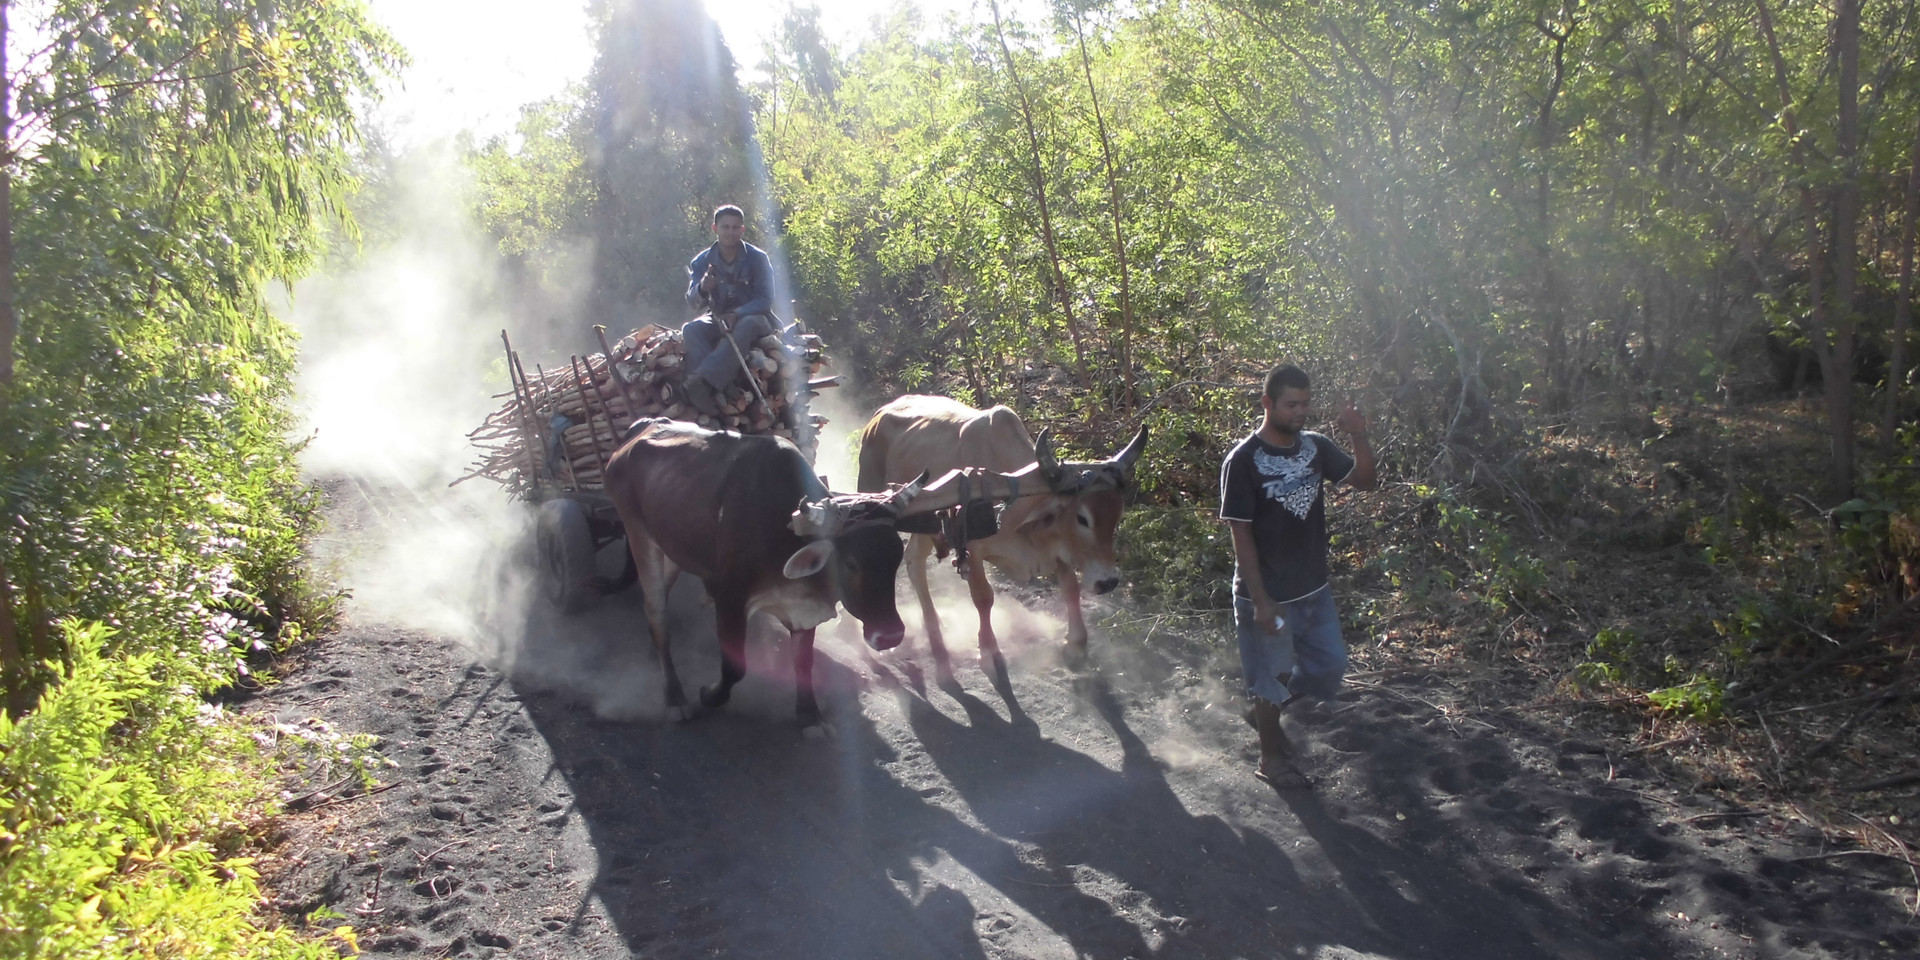 Means of transportation, Nicaragua